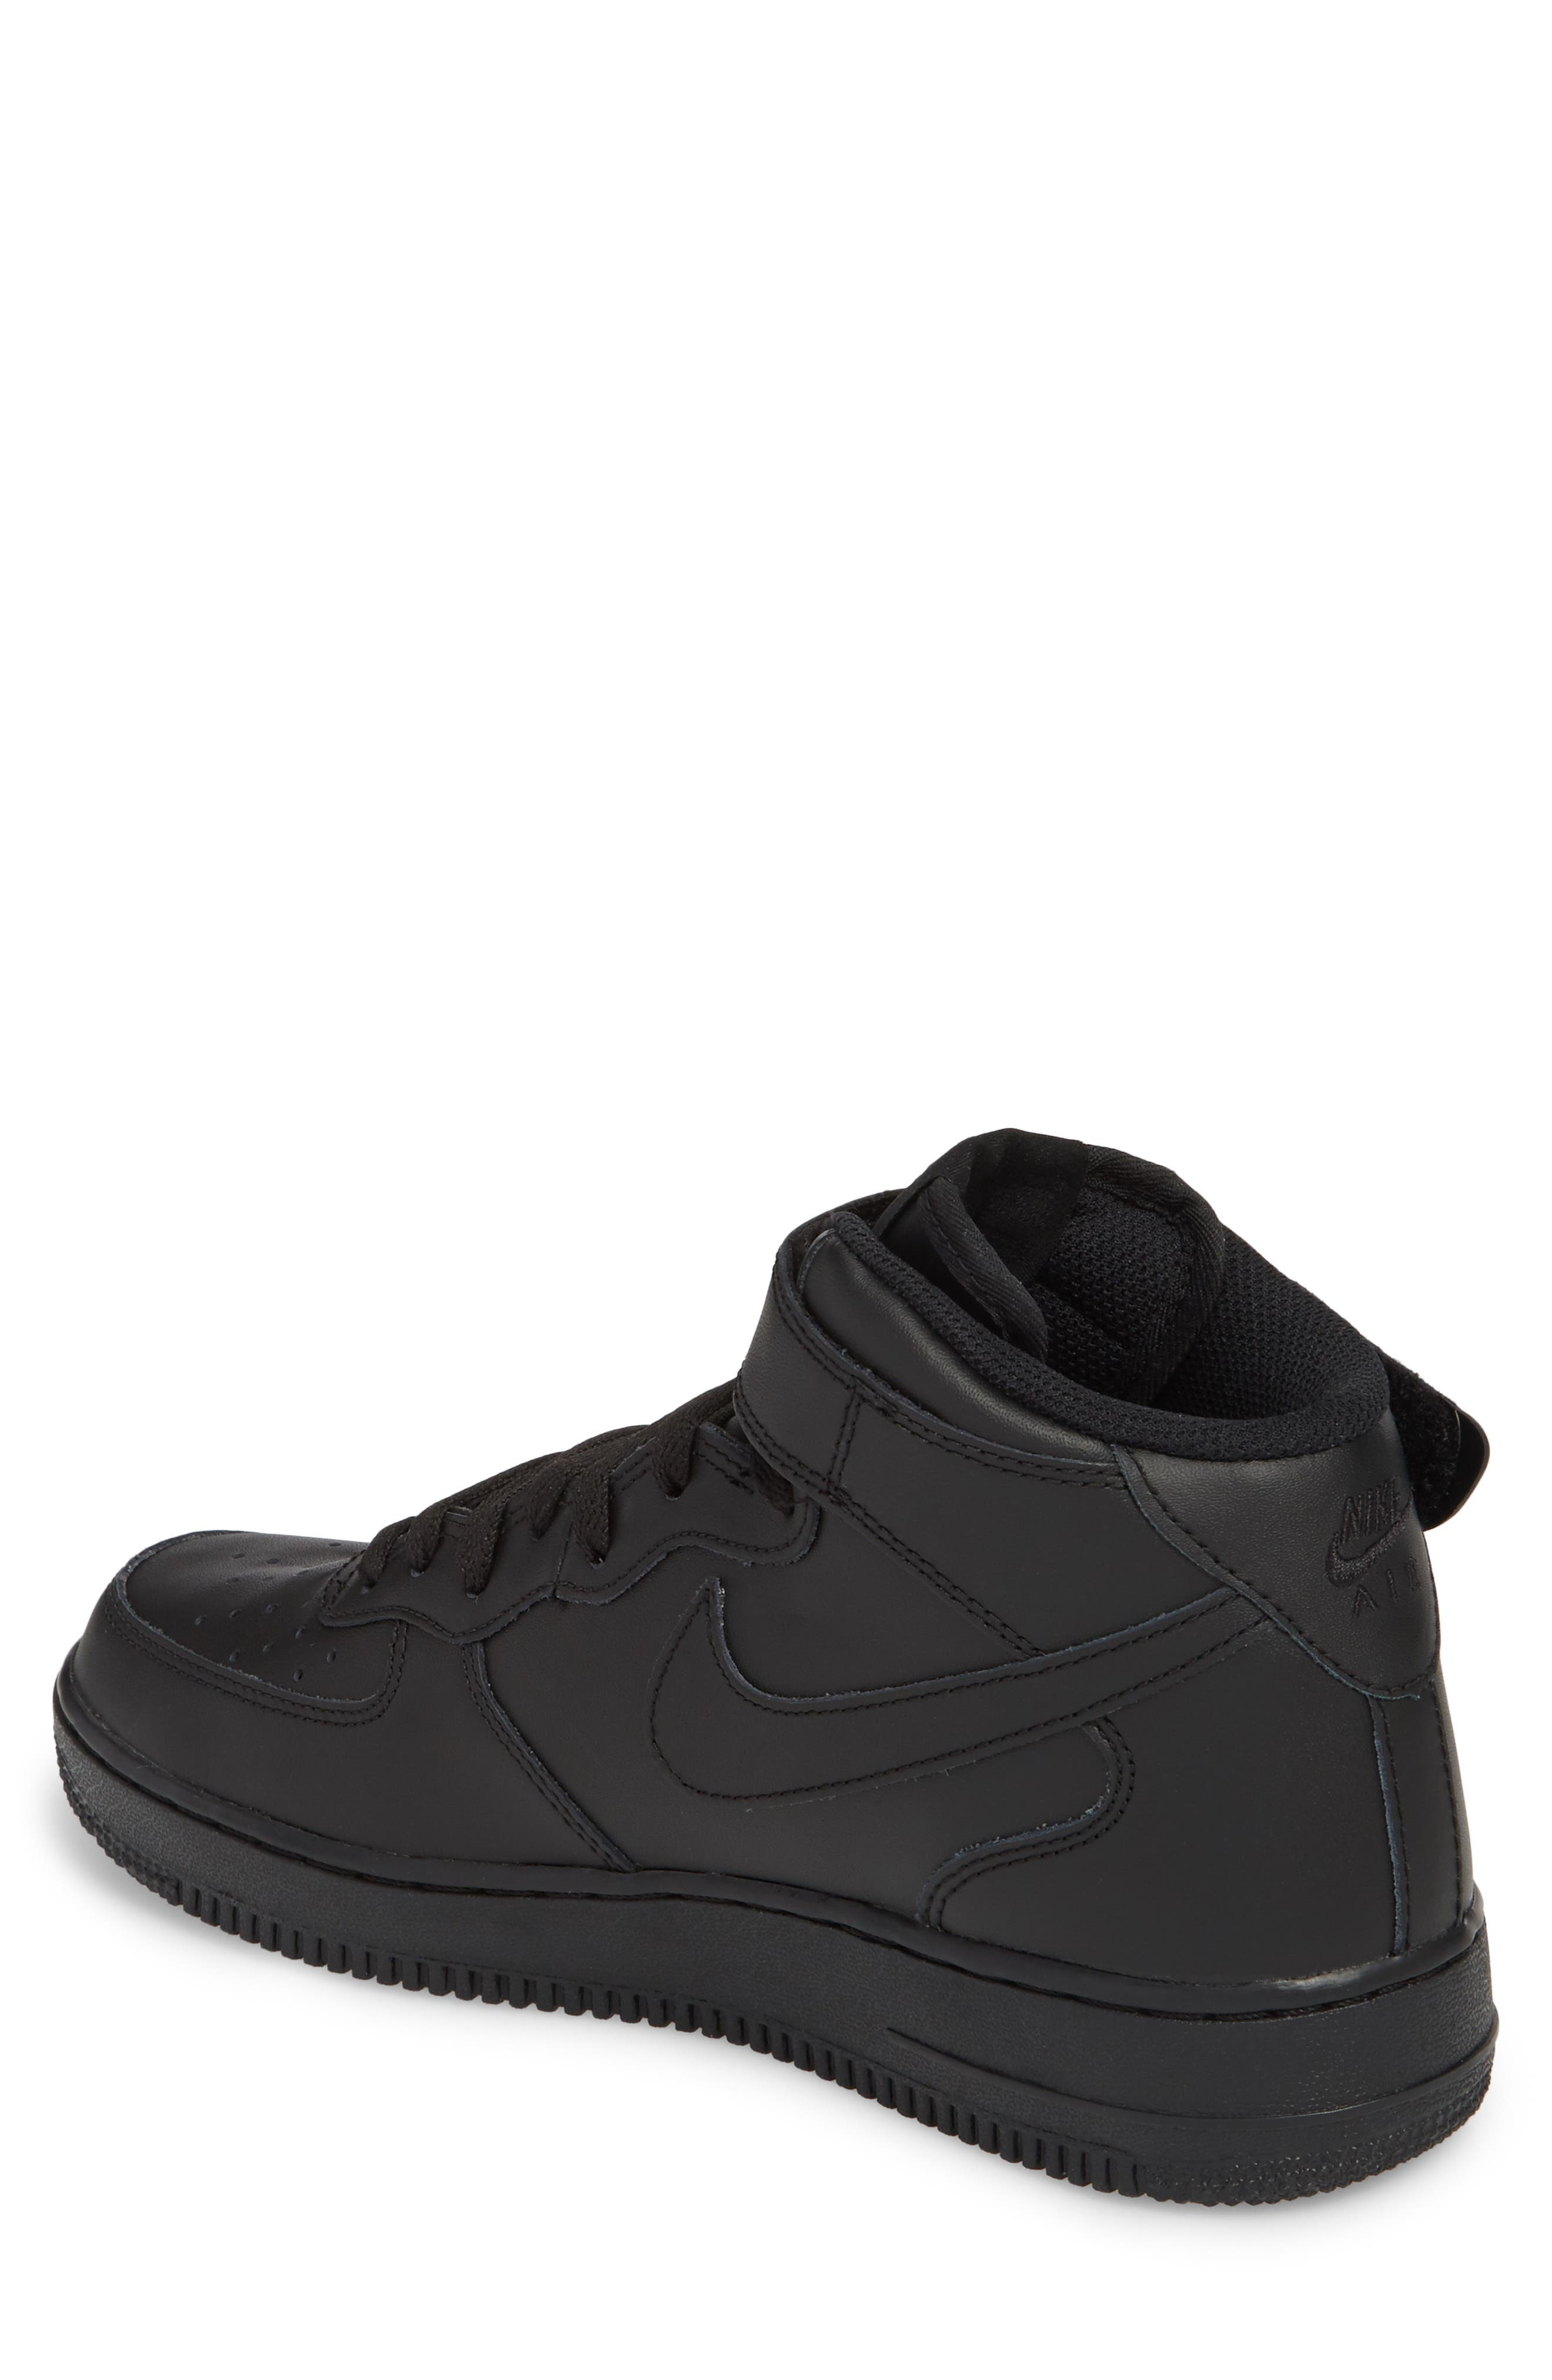 NIKE, Air Force 1 Mid '07 Sneaker, Alternate thumbnail 2, color, BLACK/ BLACK